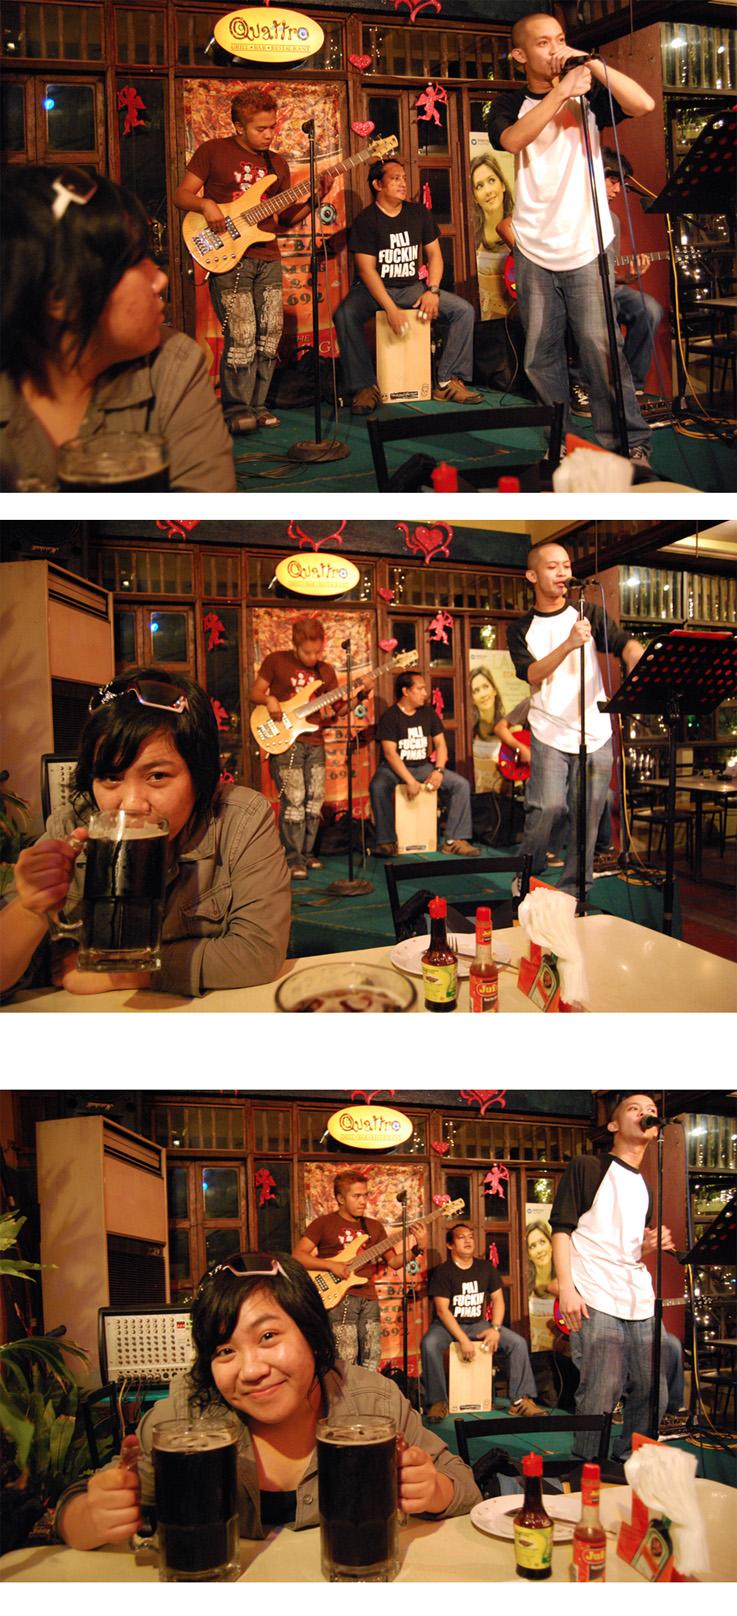 2/20/2008, Metro Manila